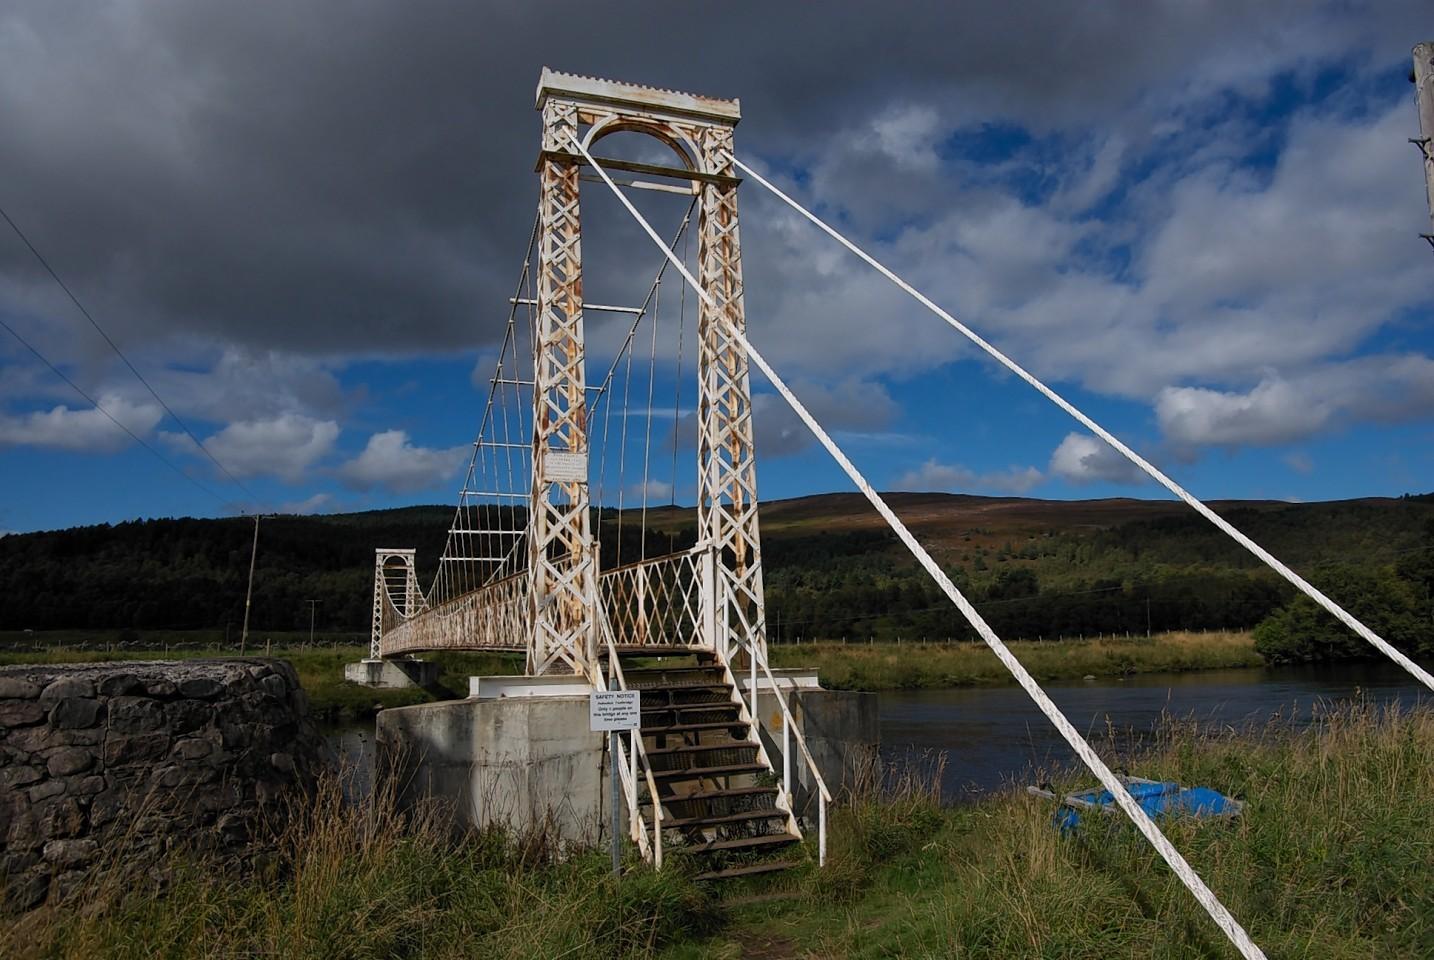 Polhollick Suspension Bridge, Ballater